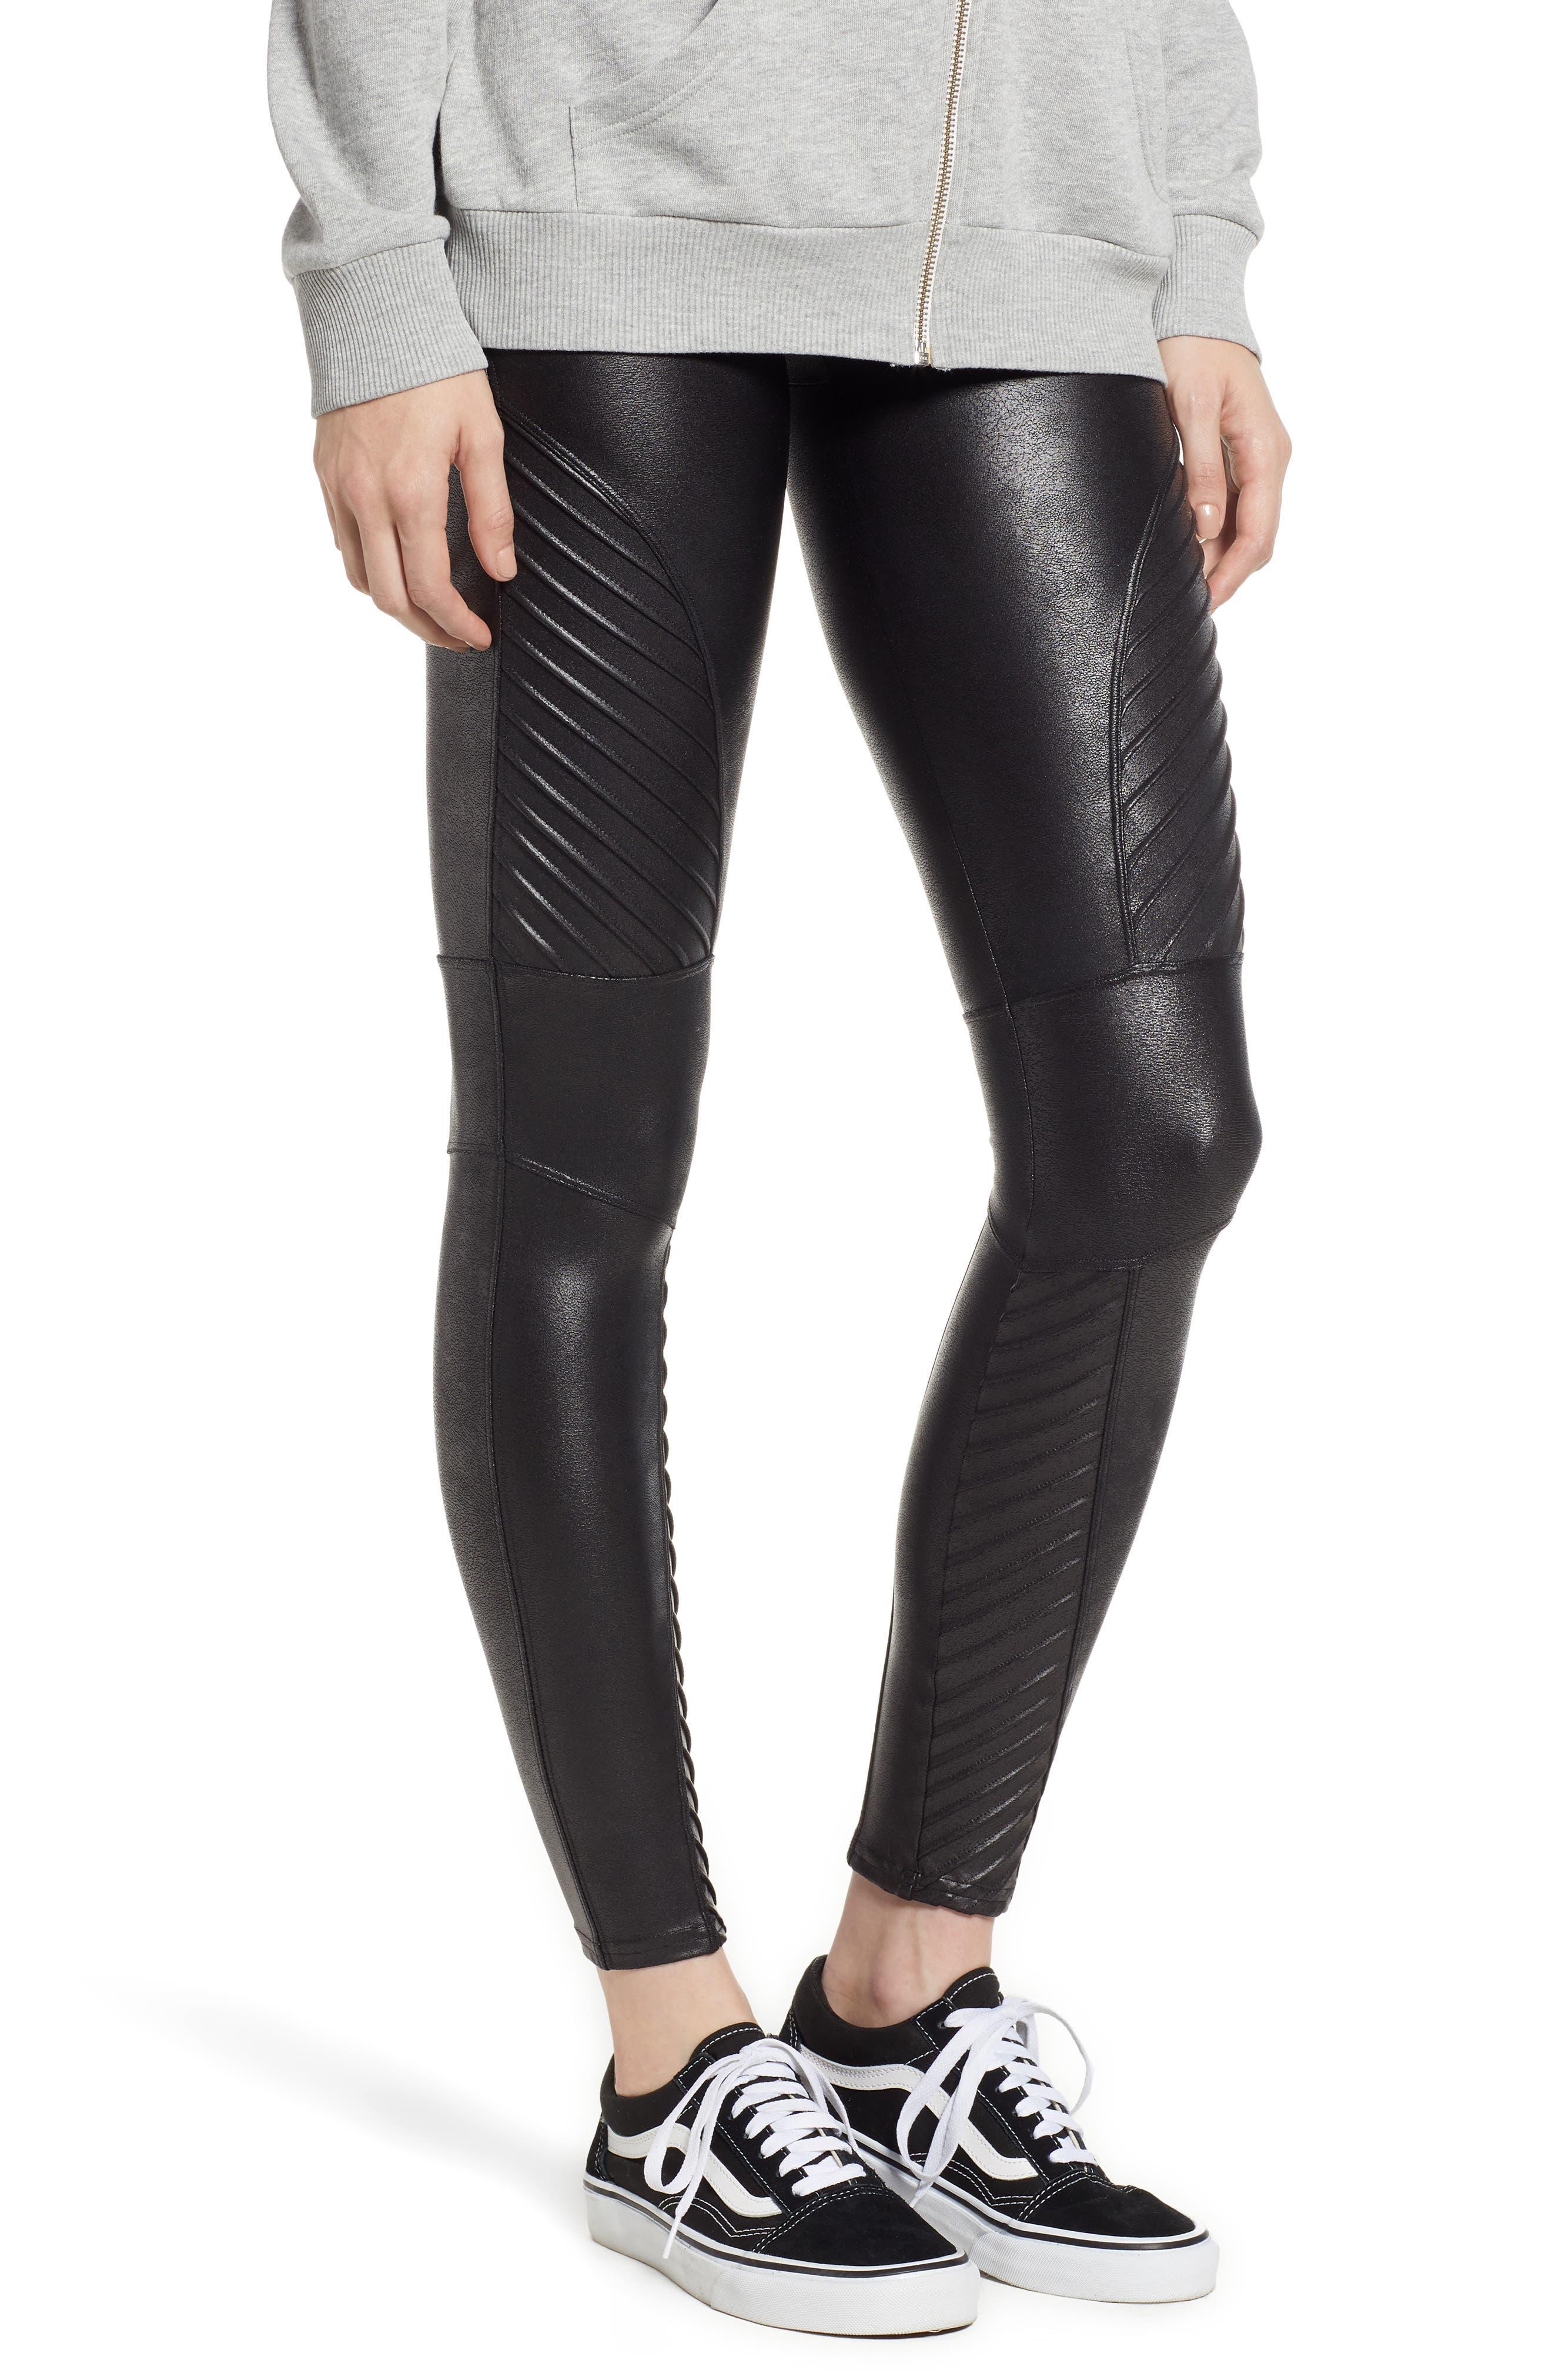 Petite Women's Spanx Faux Leather Moto Leggings